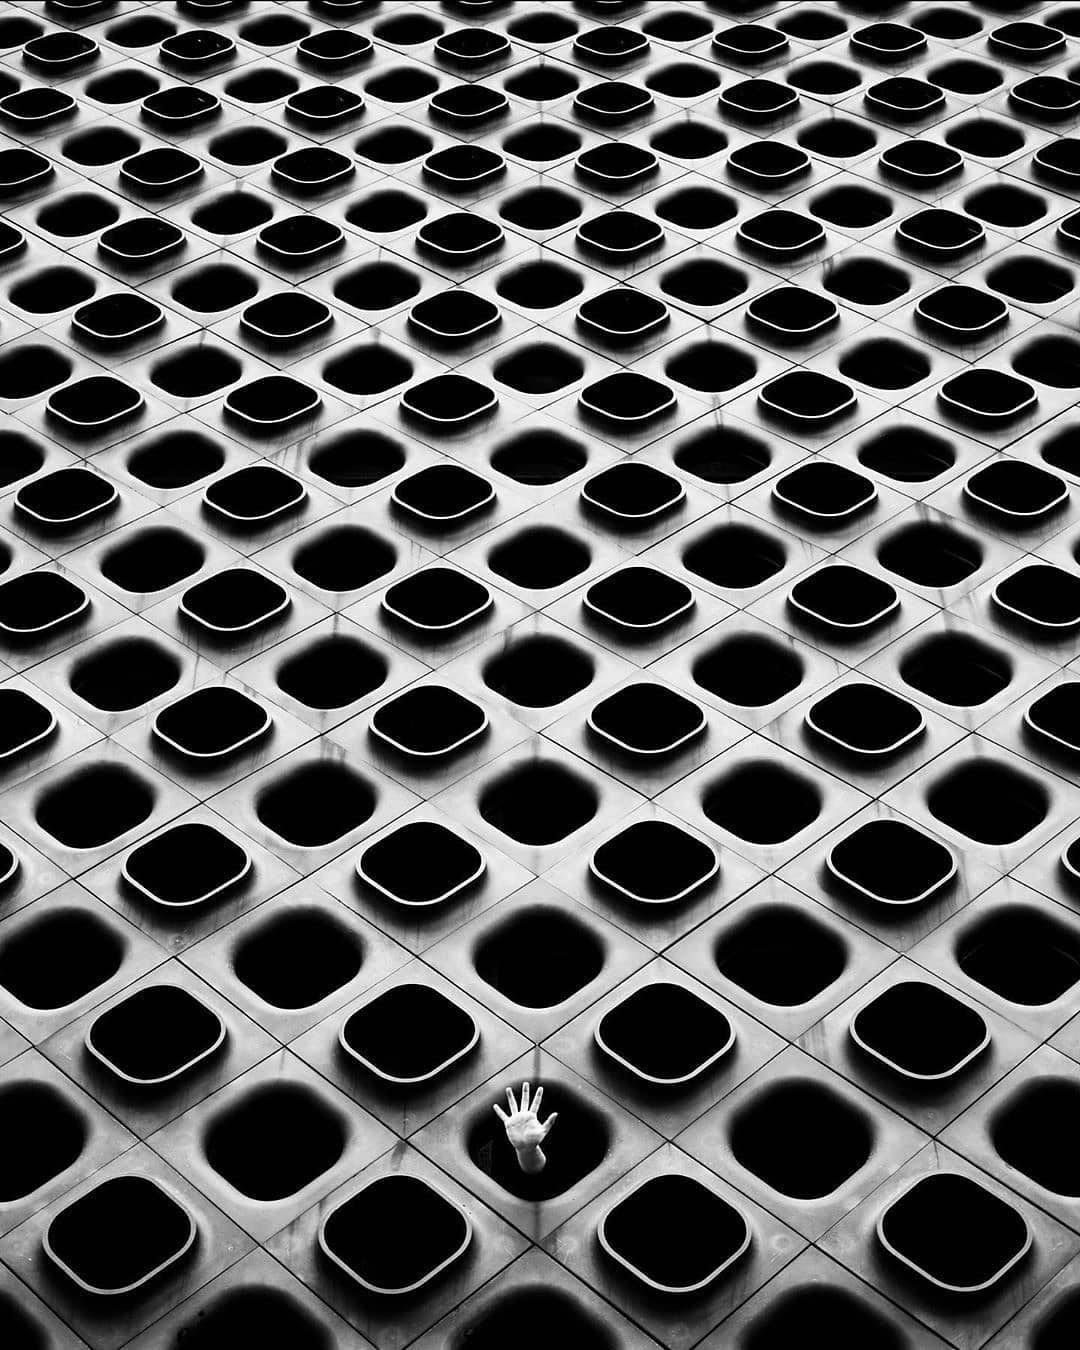 Pin by Kim Sam on Extraordinary Photography Instagram